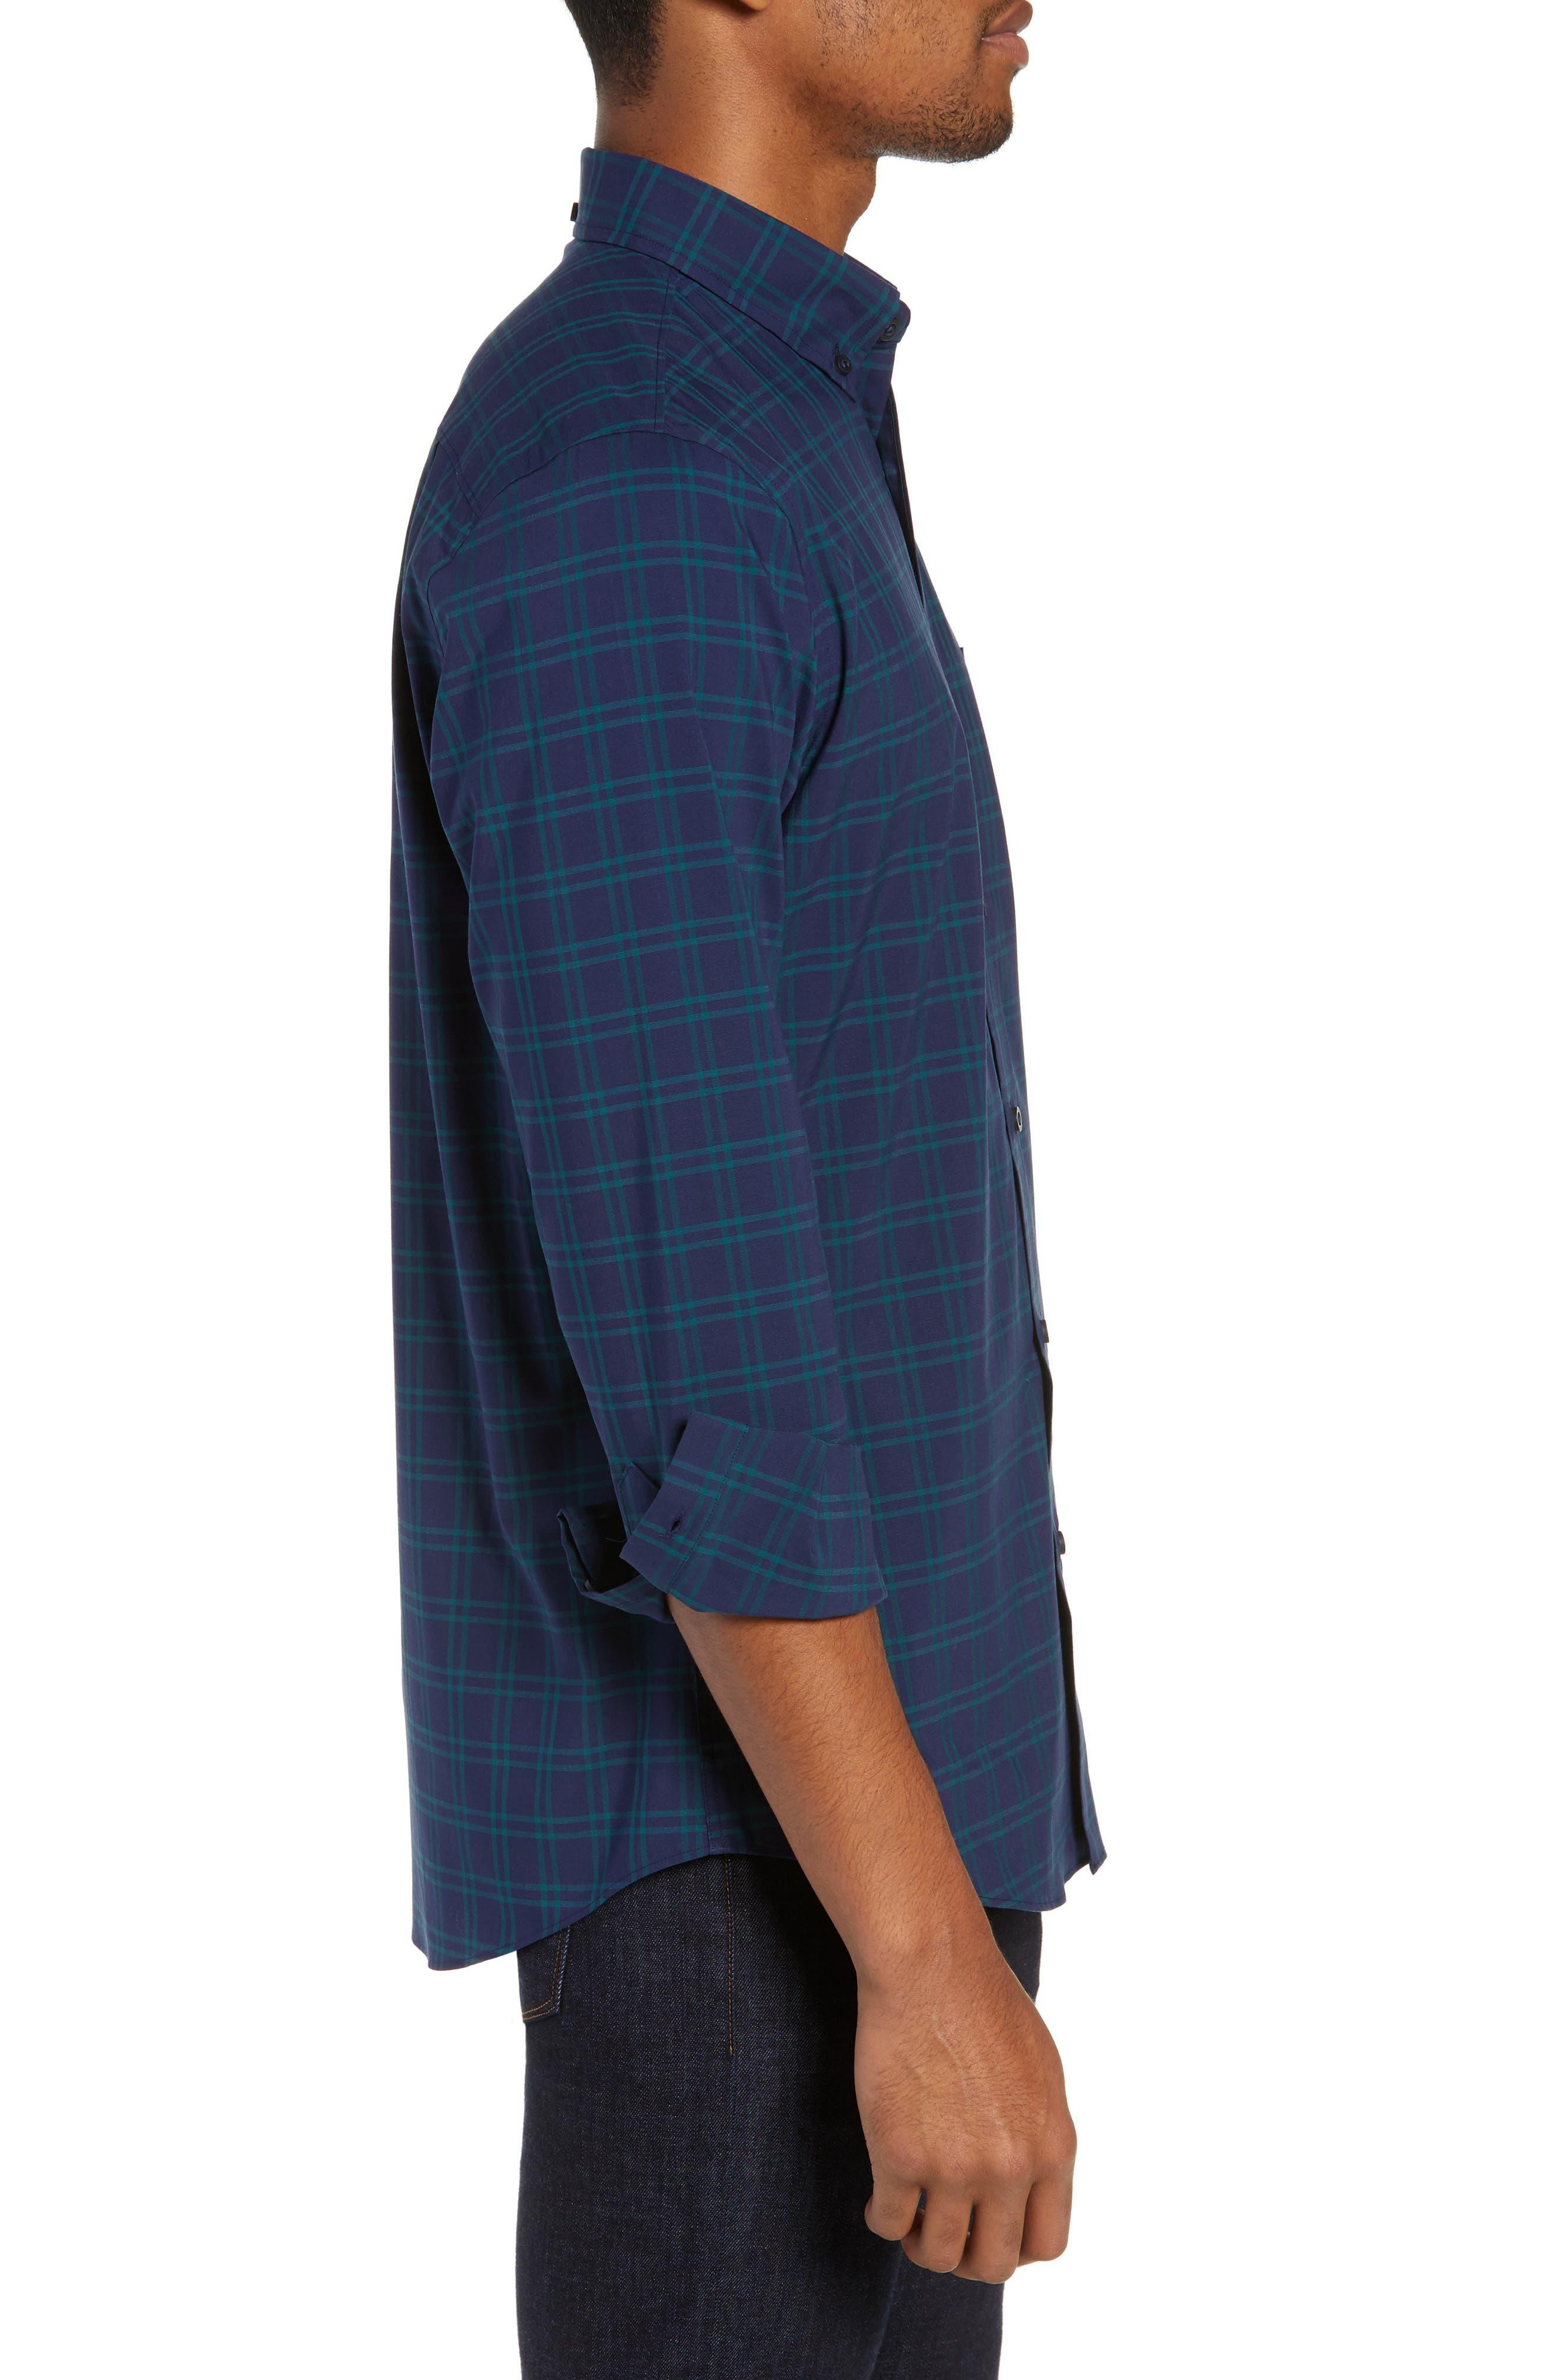 NORDSTROM MEN'S SHOP,                             Tech-Smart Slim Fit Check Sport Shirt,                             Alternate thumbnail 3, color,                             NAVY IRIS TEAL WINDOWPANE